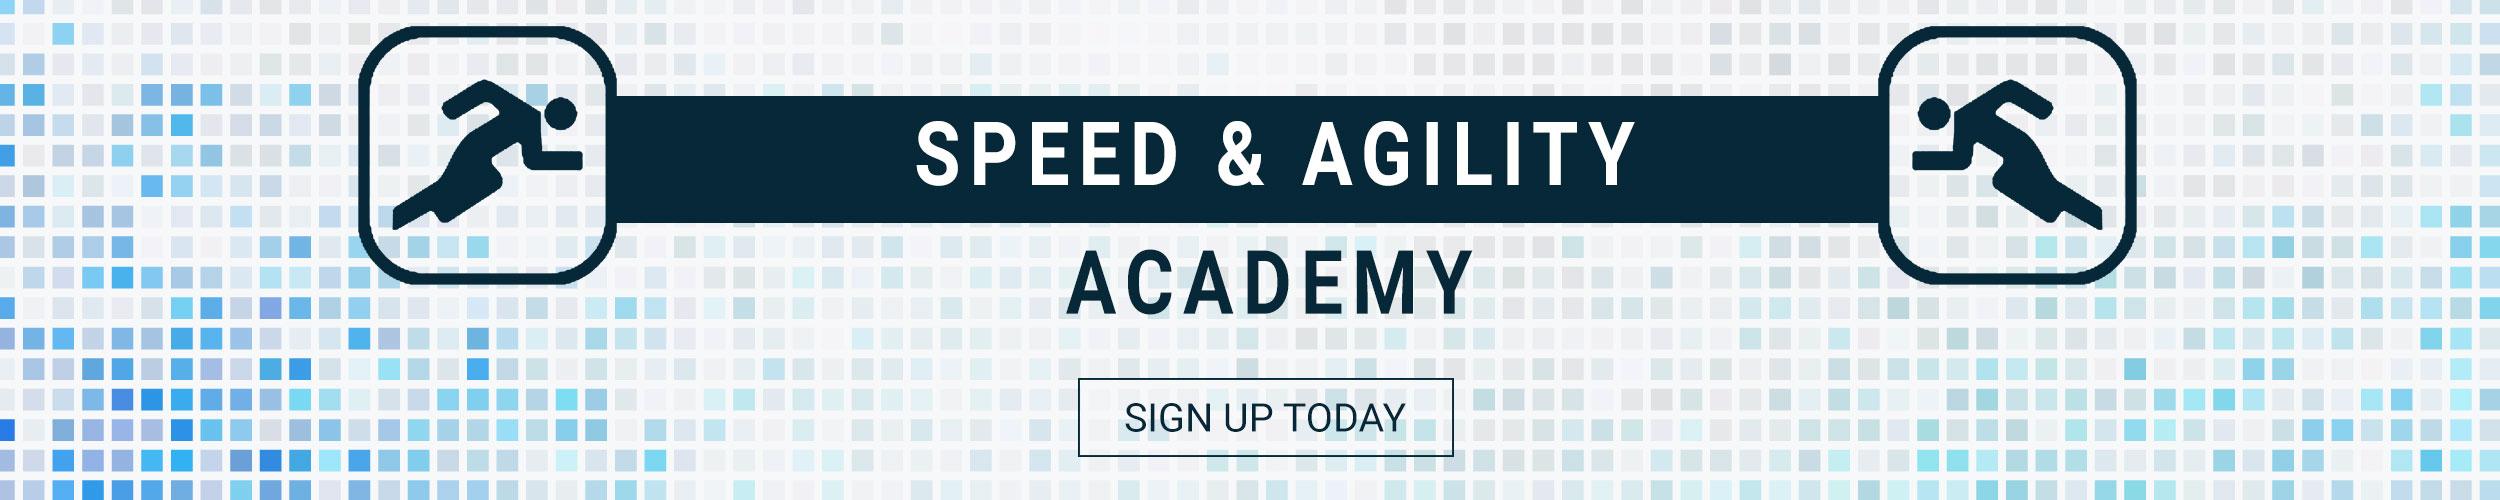 Speed and Agility Academy, Paw Paw, Michigan